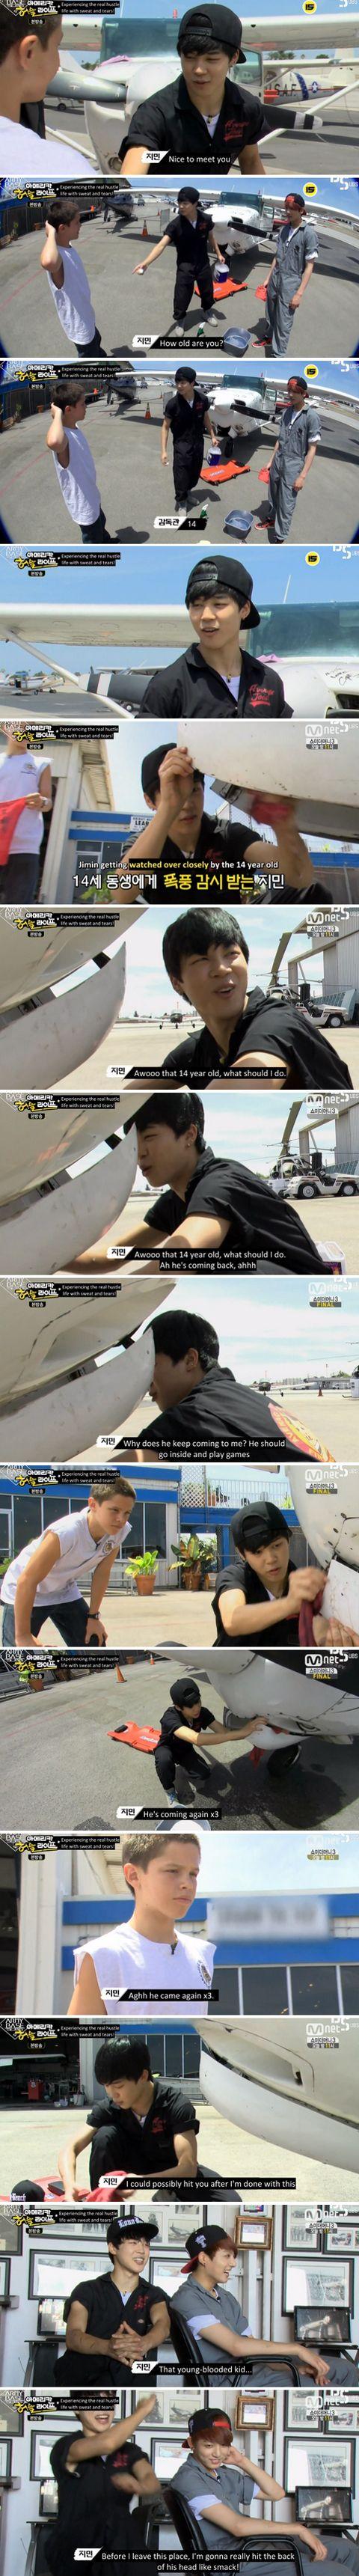 BTS | Bangtan | Jimin | AHL | Credit: ayshxing.tumblr.com/post/127944223771/jimin-was-ready-to-fight-that-kid-that-day